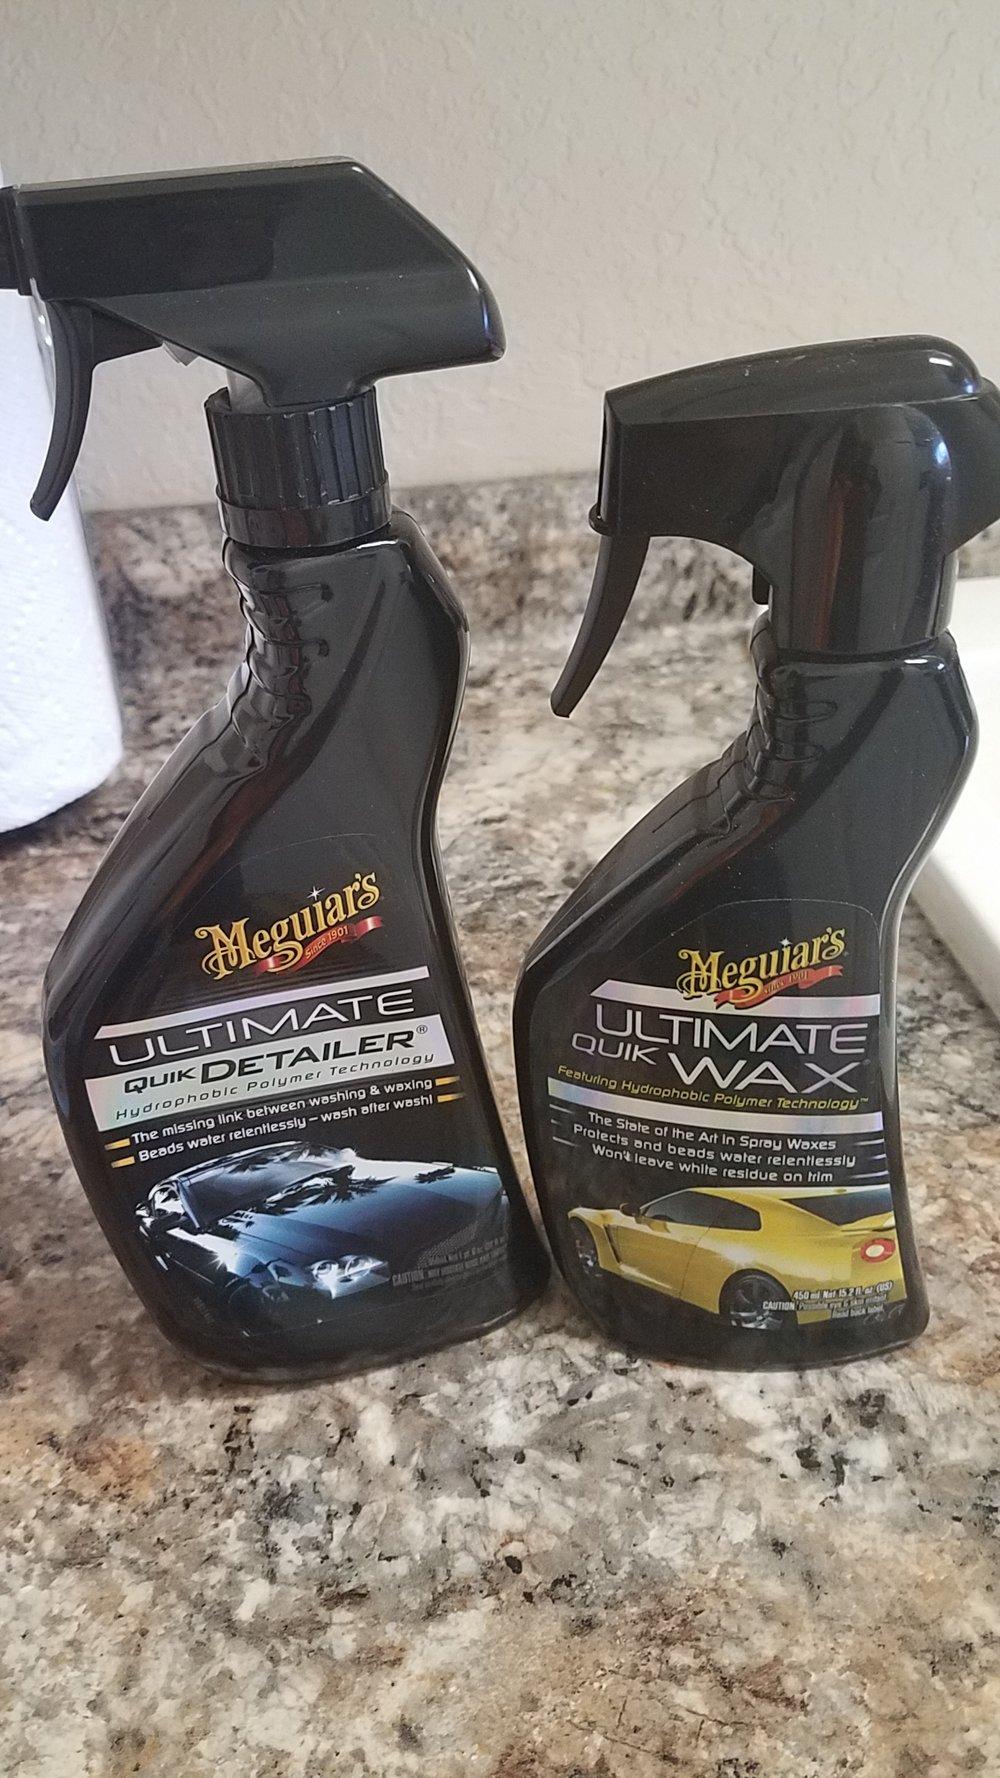 Meguiars Spray Wax (Right)